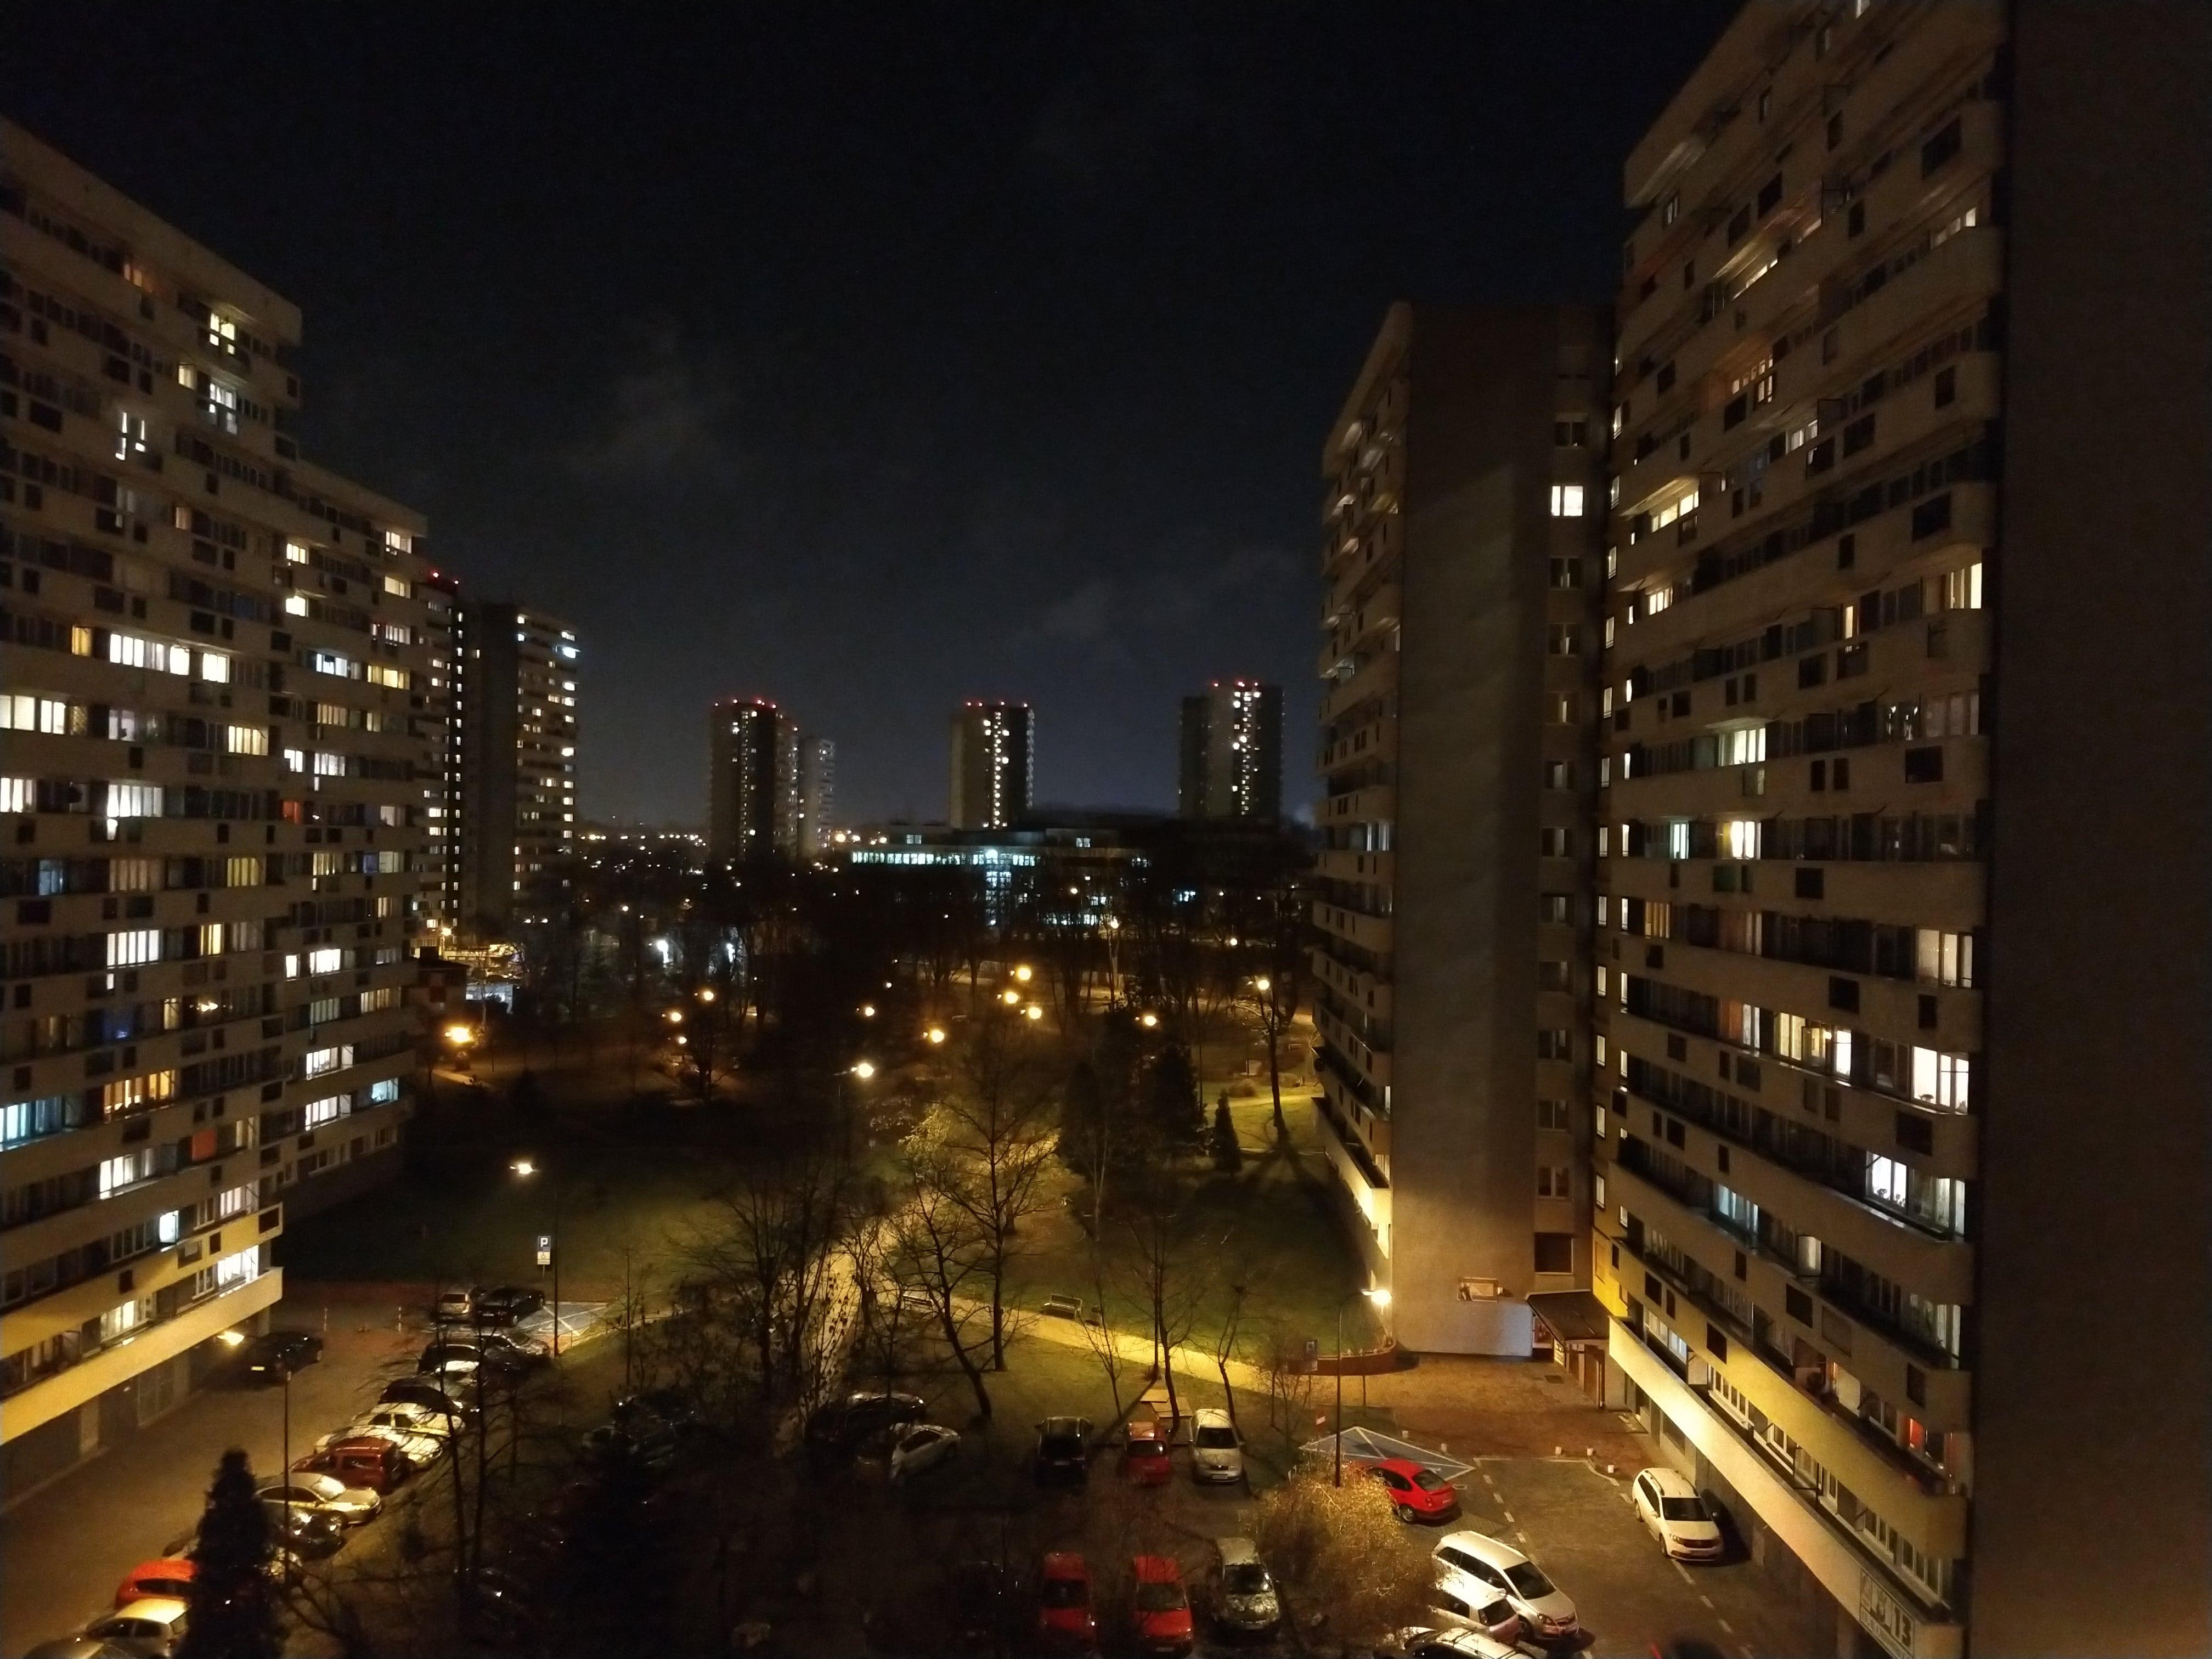 Zdjęcia nocne - Motorola Moto Z3 Play